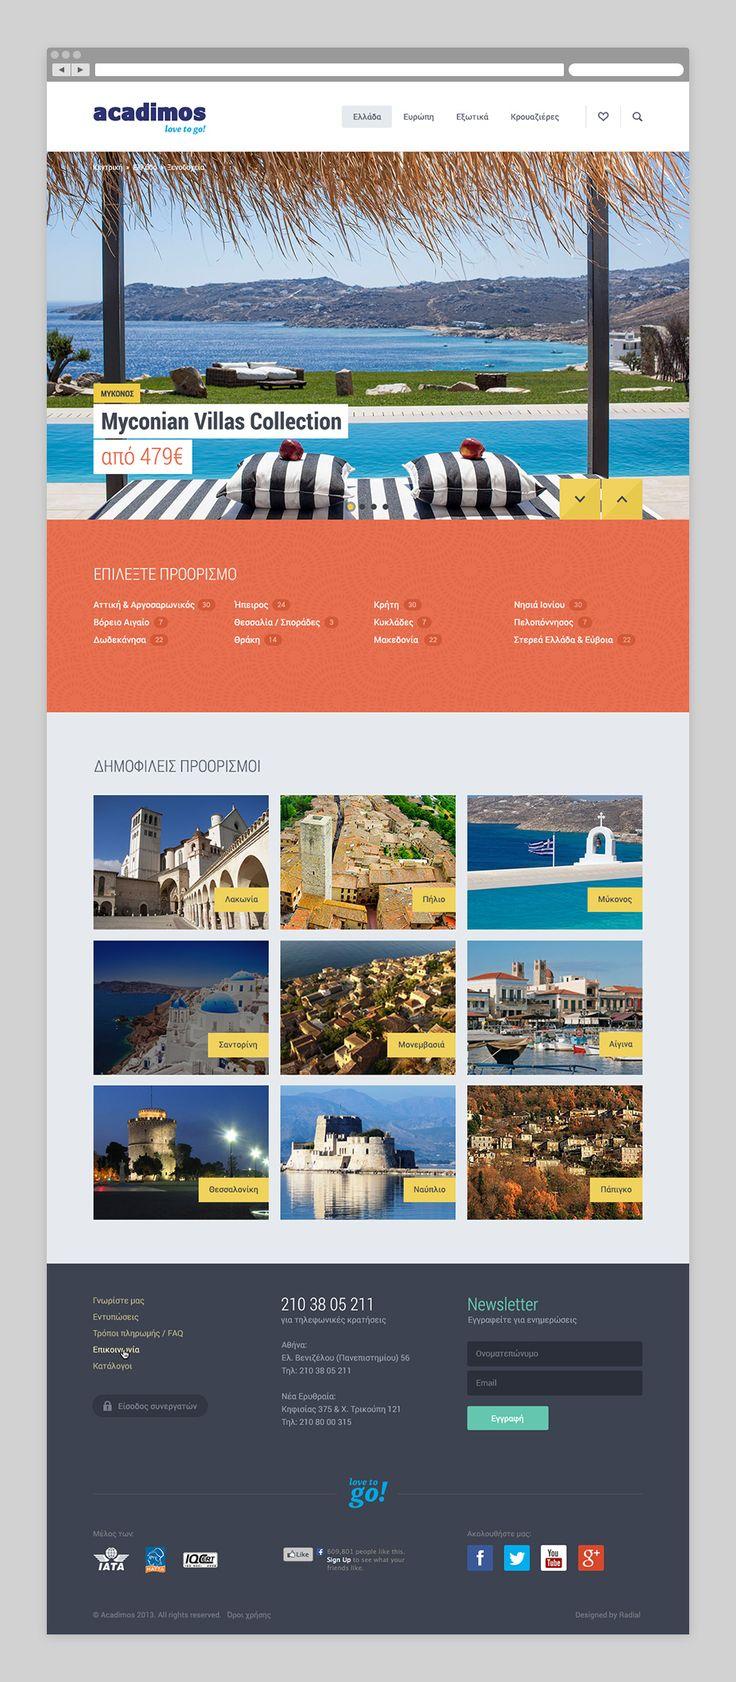 Acadimos Travel | Radial